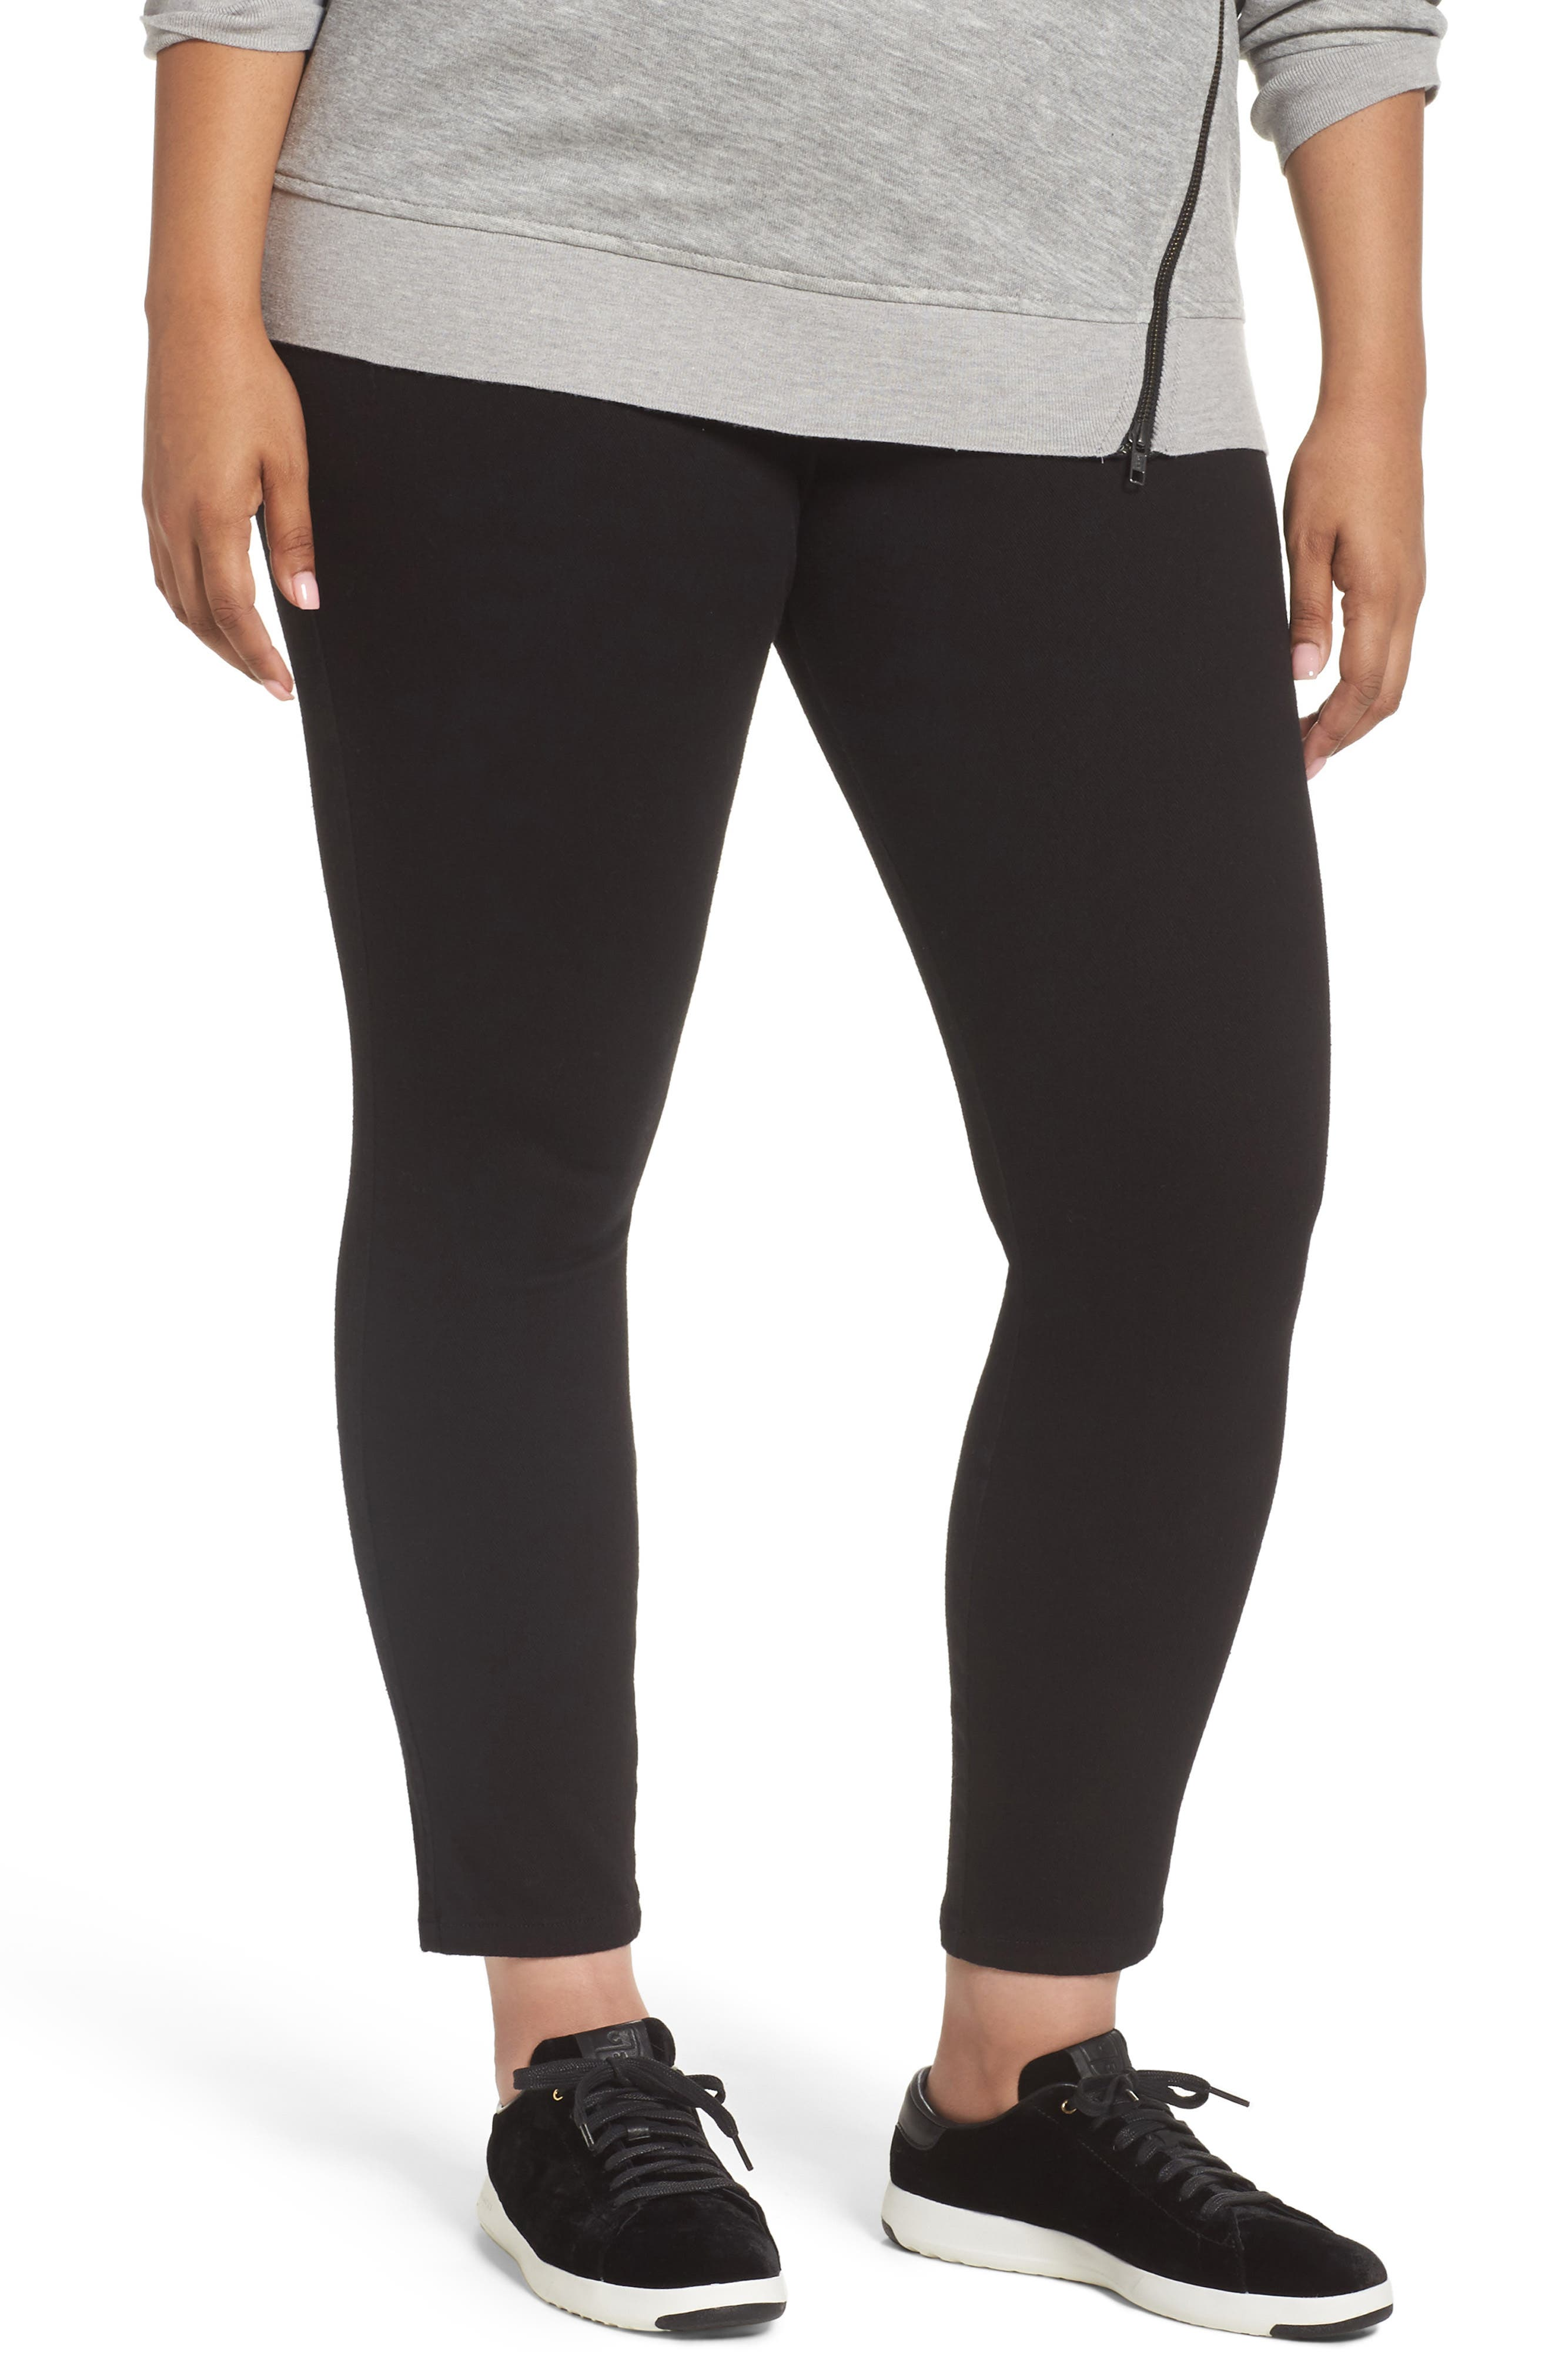 Lyssè Toothpick Denim Leggings,                         Main,                         color, Black